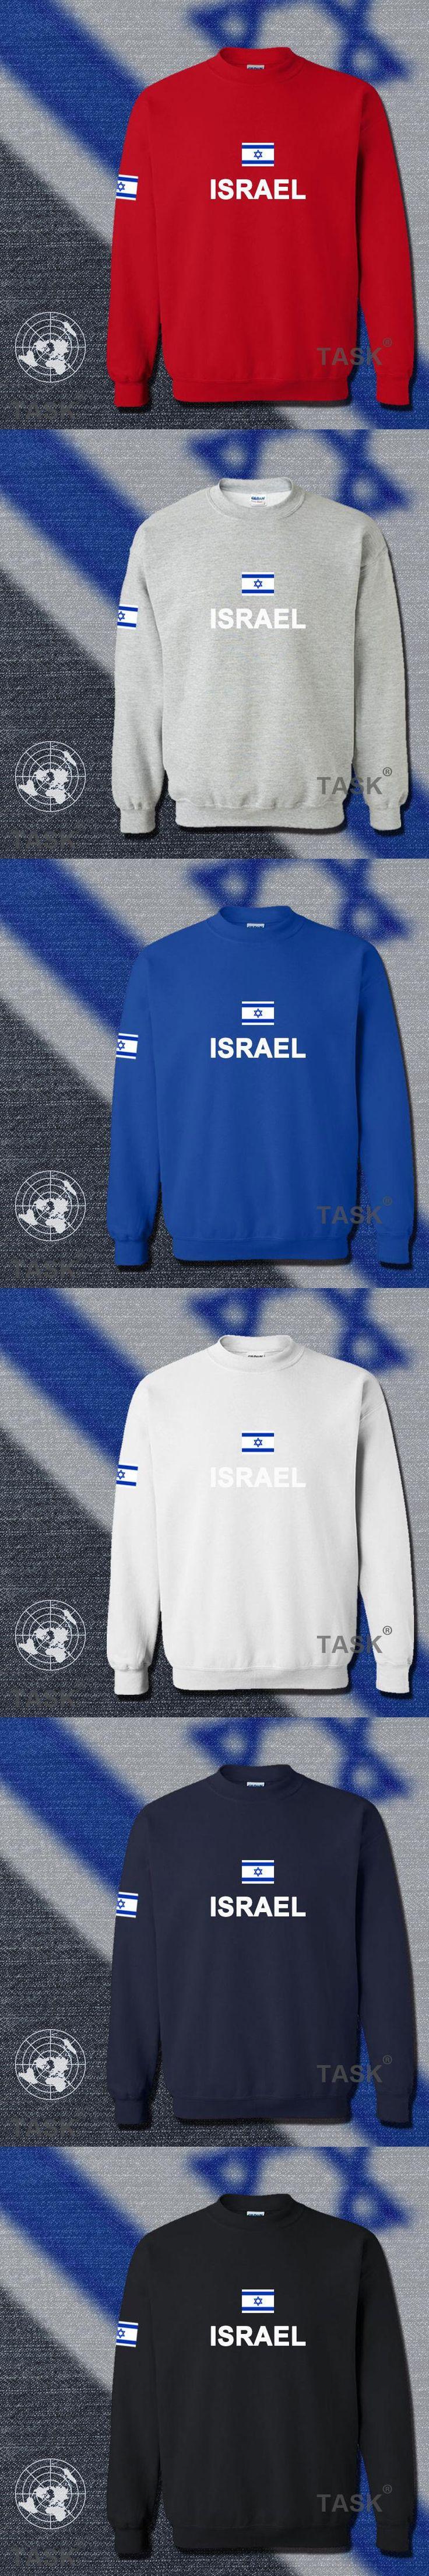 Israel hoodies men sweatshirt polo sweats new hip hop streetwear footballes jerseyes tracksuit nation Israeli flag IL fleece